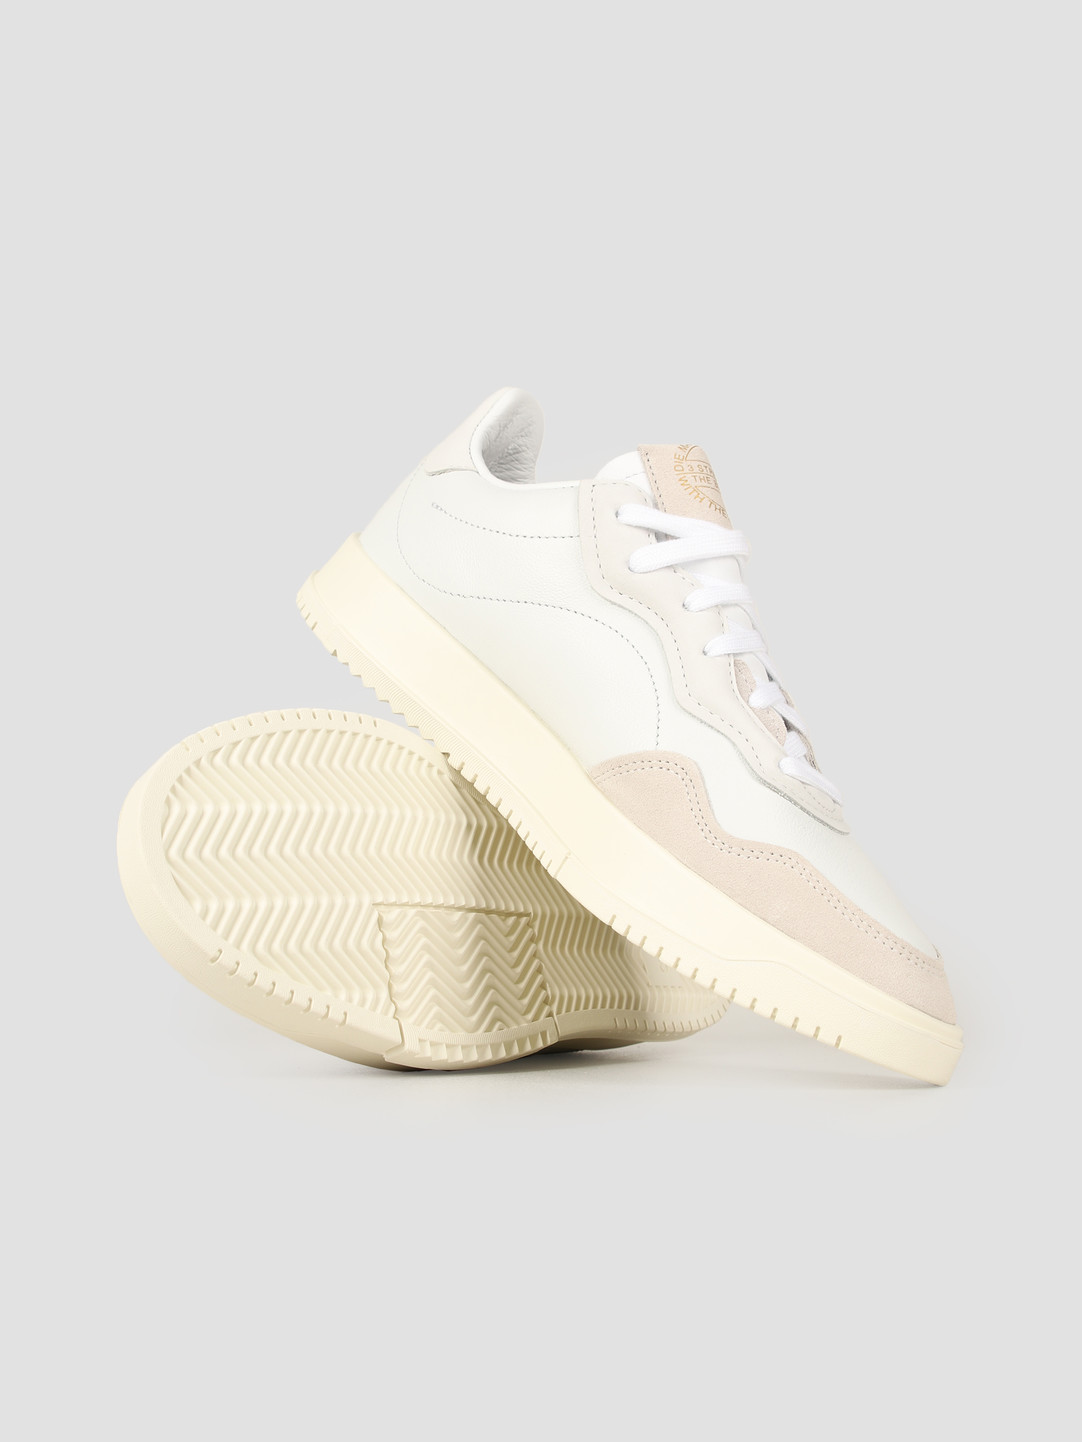 adidas adidas Sc Premiere Crywht Crywht Cwhite EE7720